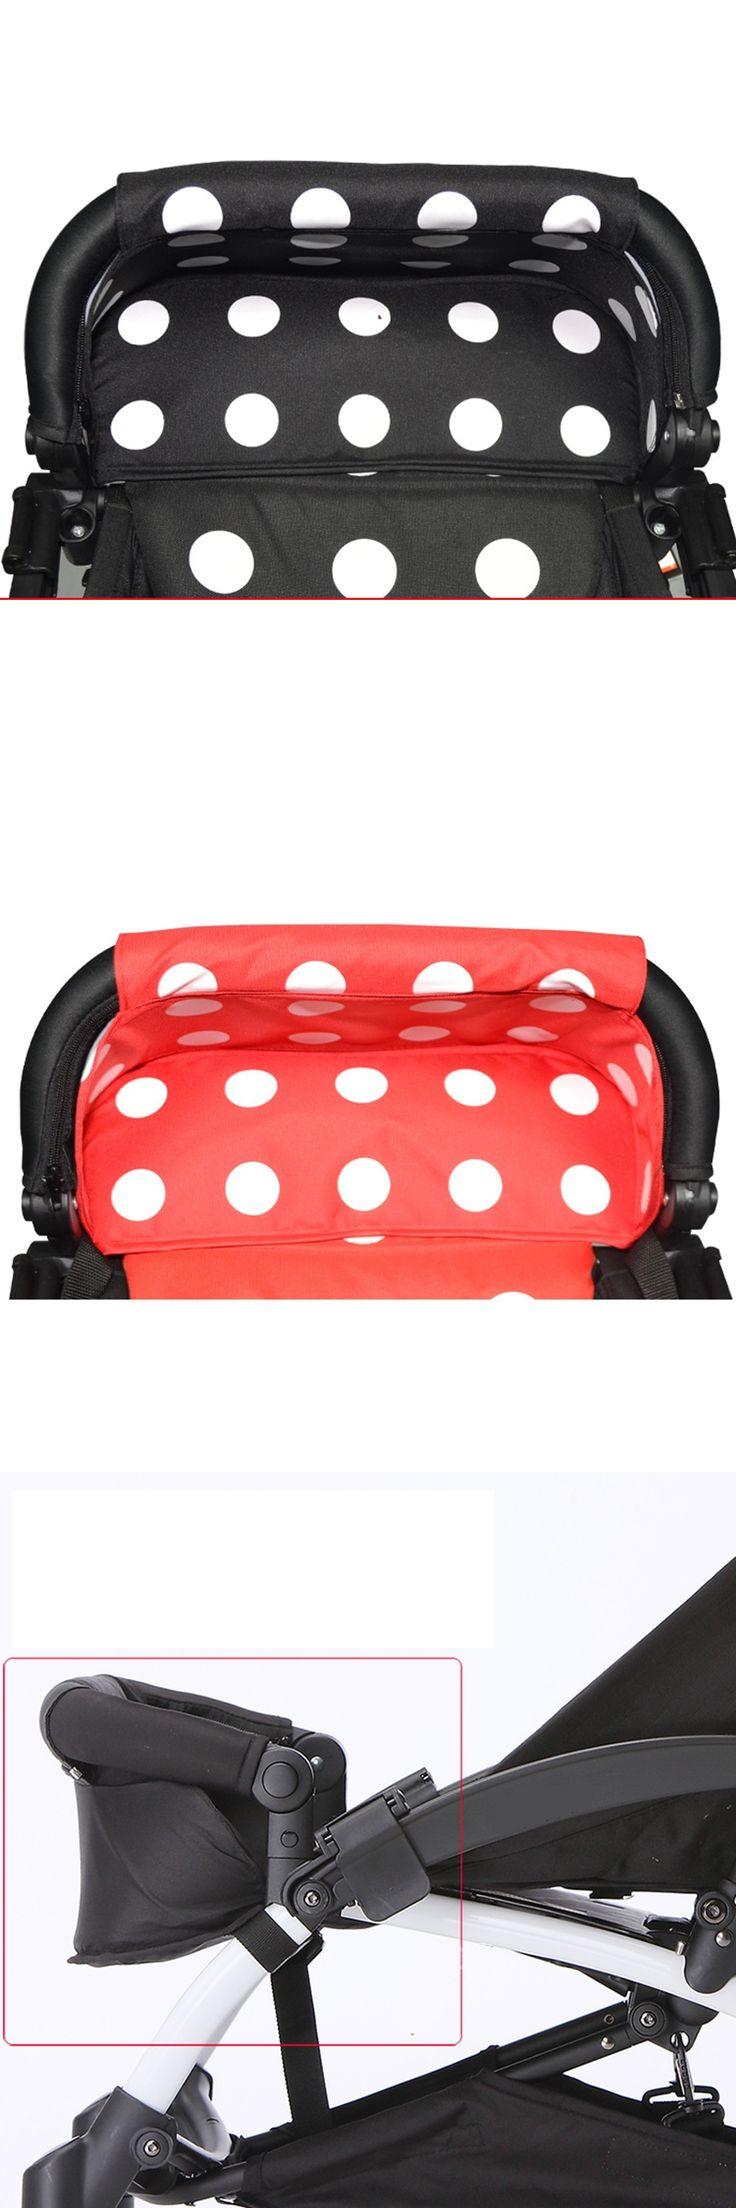 Foot Extension Layer for Baby Stroller Neboren Footrest for Pram Umbrella Stroller Accessories